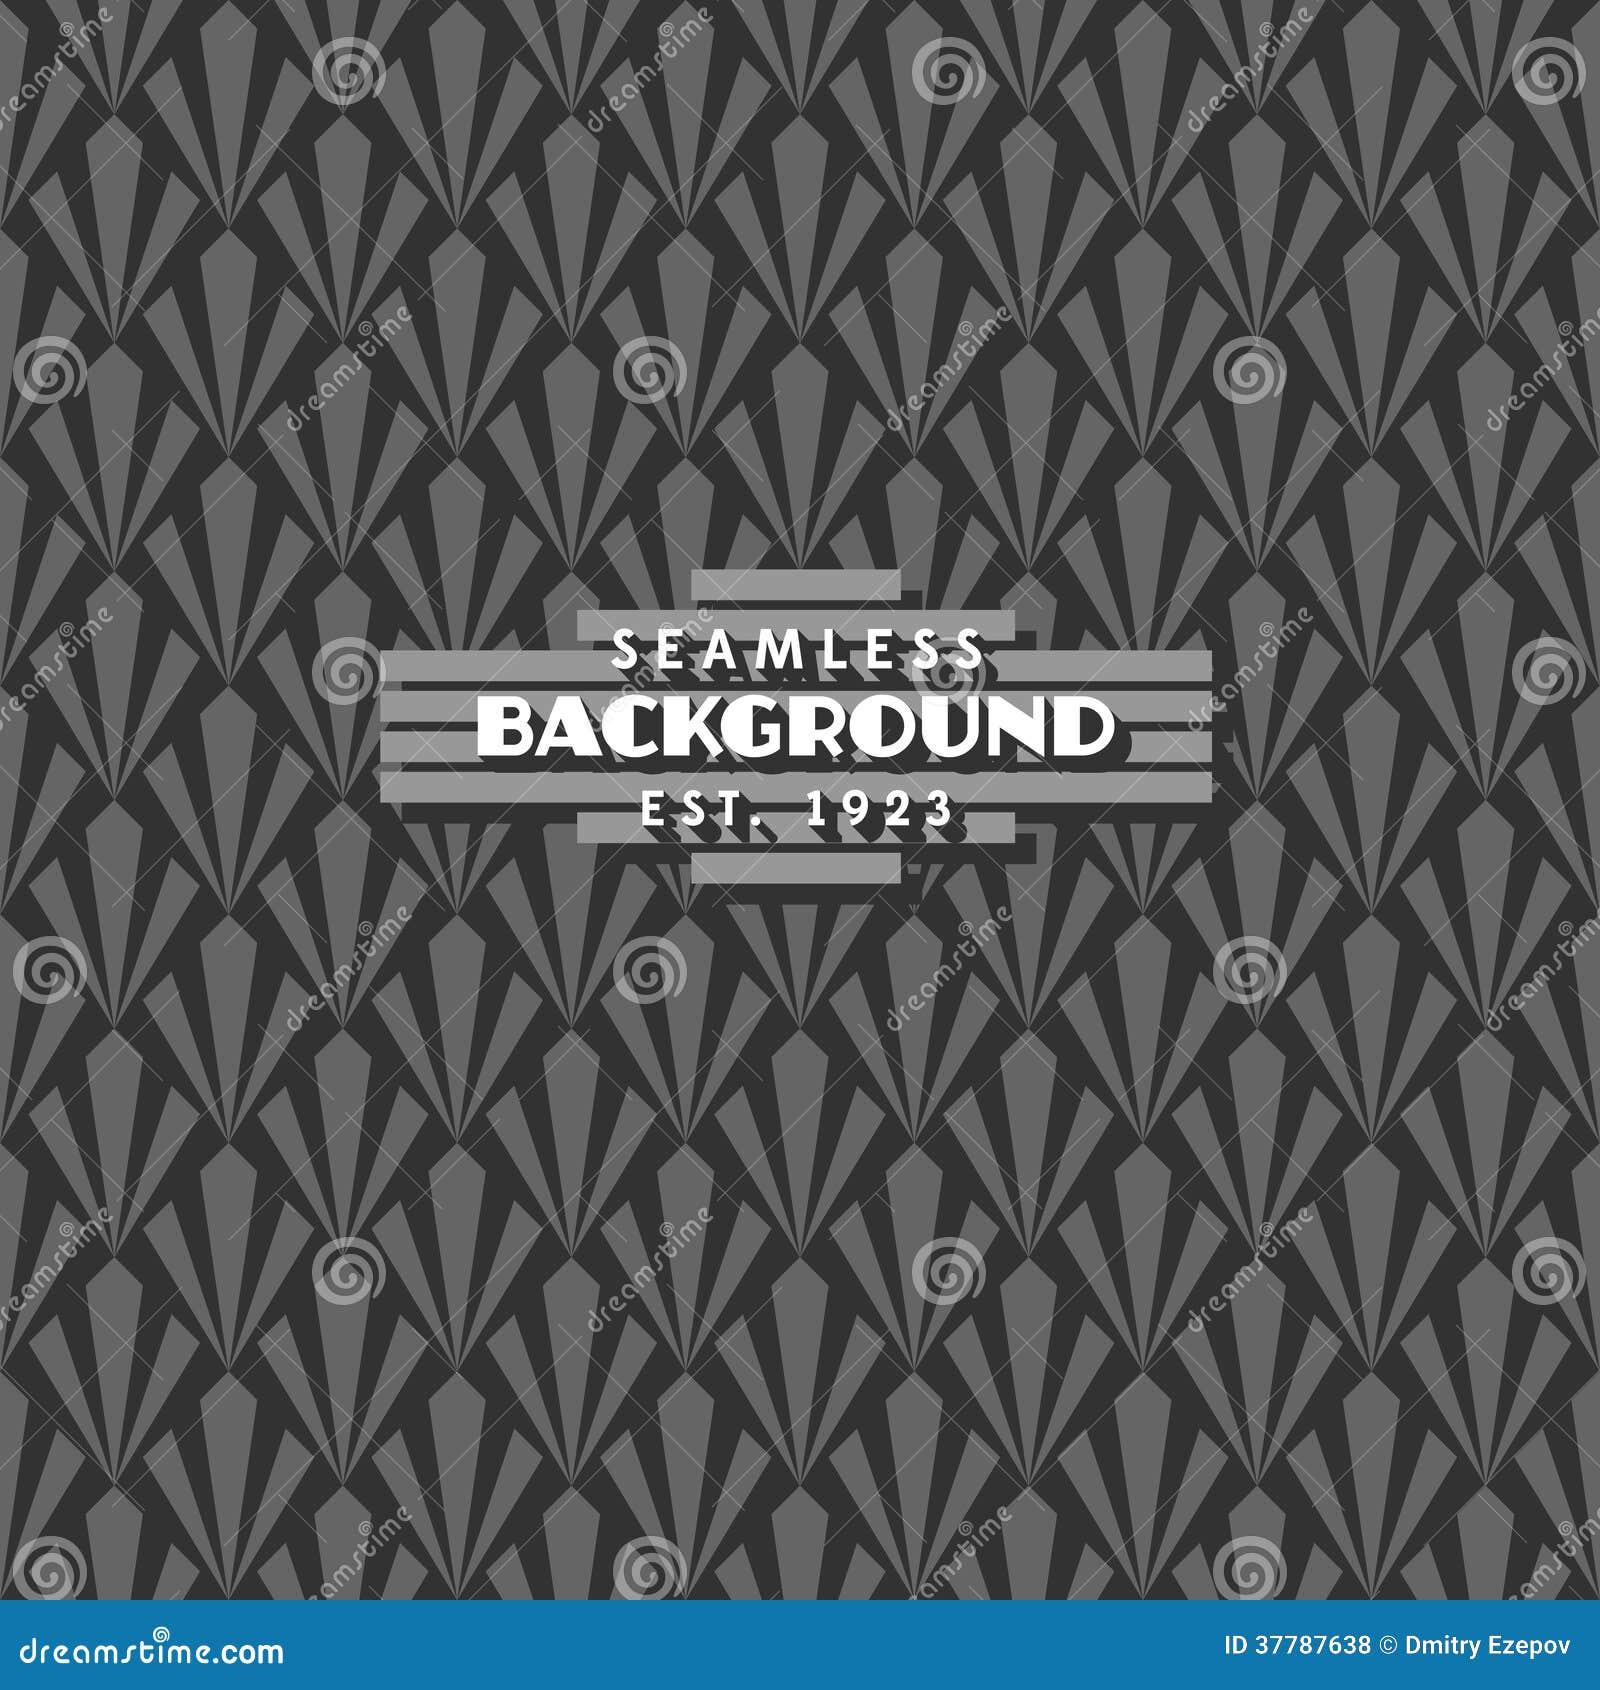 art deco clip art background - photo #15